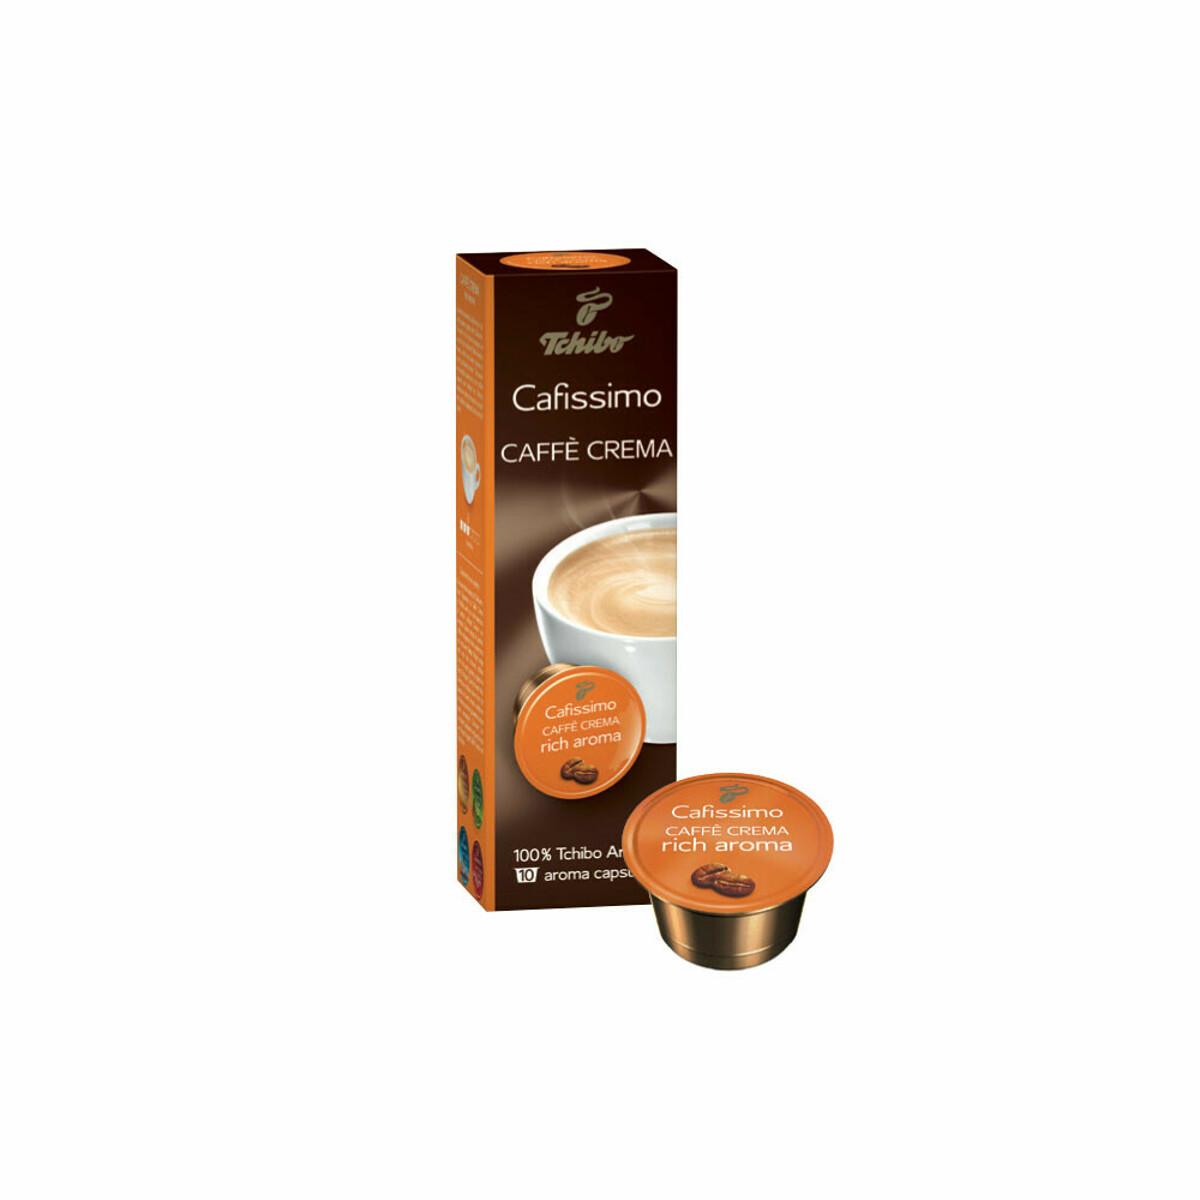 TCHIBO CAFISSIMO CAFFE CREMA RICH AROMALI 10'LU KAPSUL KAHVE